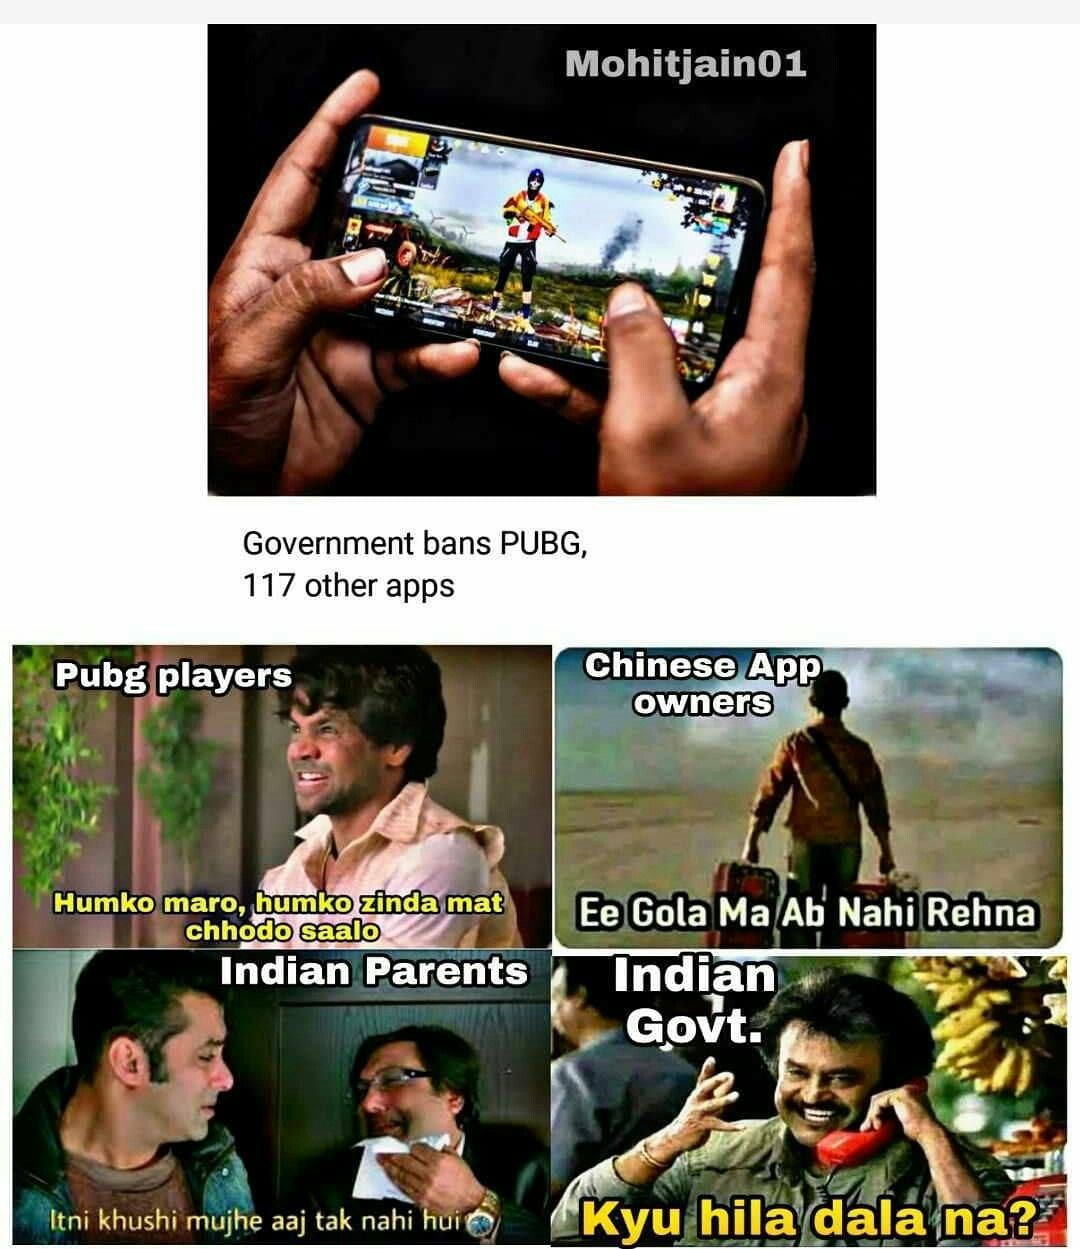 Pin By Jishan Haque On Funny Very Funny Memes Funny Kid Memes Really Funny Memes